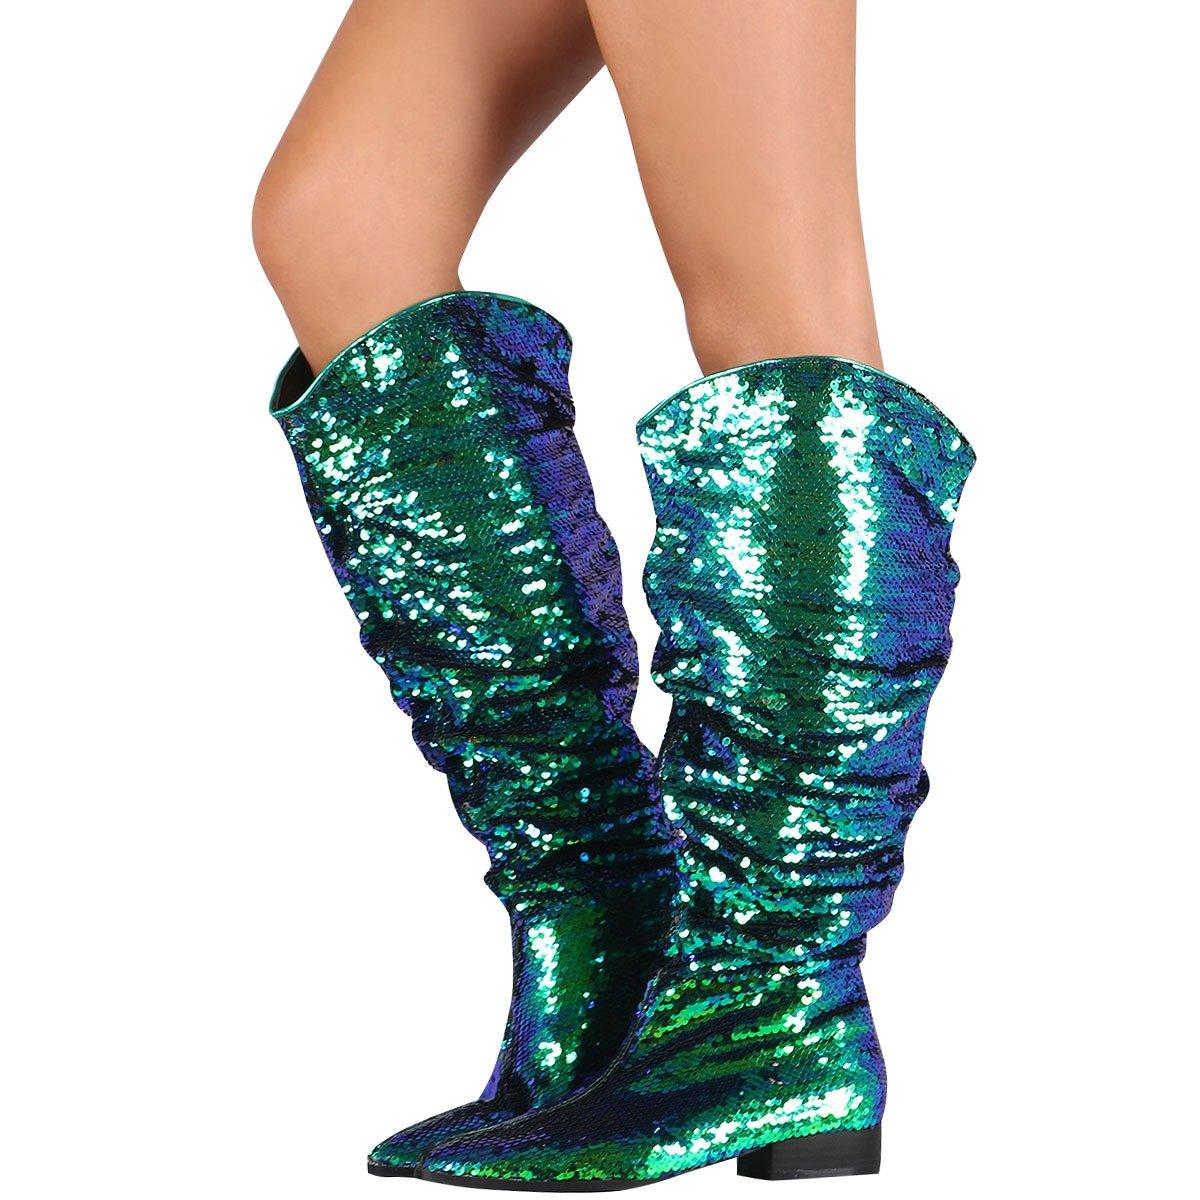 CAPE ROBBIN Womens Pointy Toe Knee High Pull On Slouchy Cowboy Western Low Flat Heel Boots 7.5 Mermaid